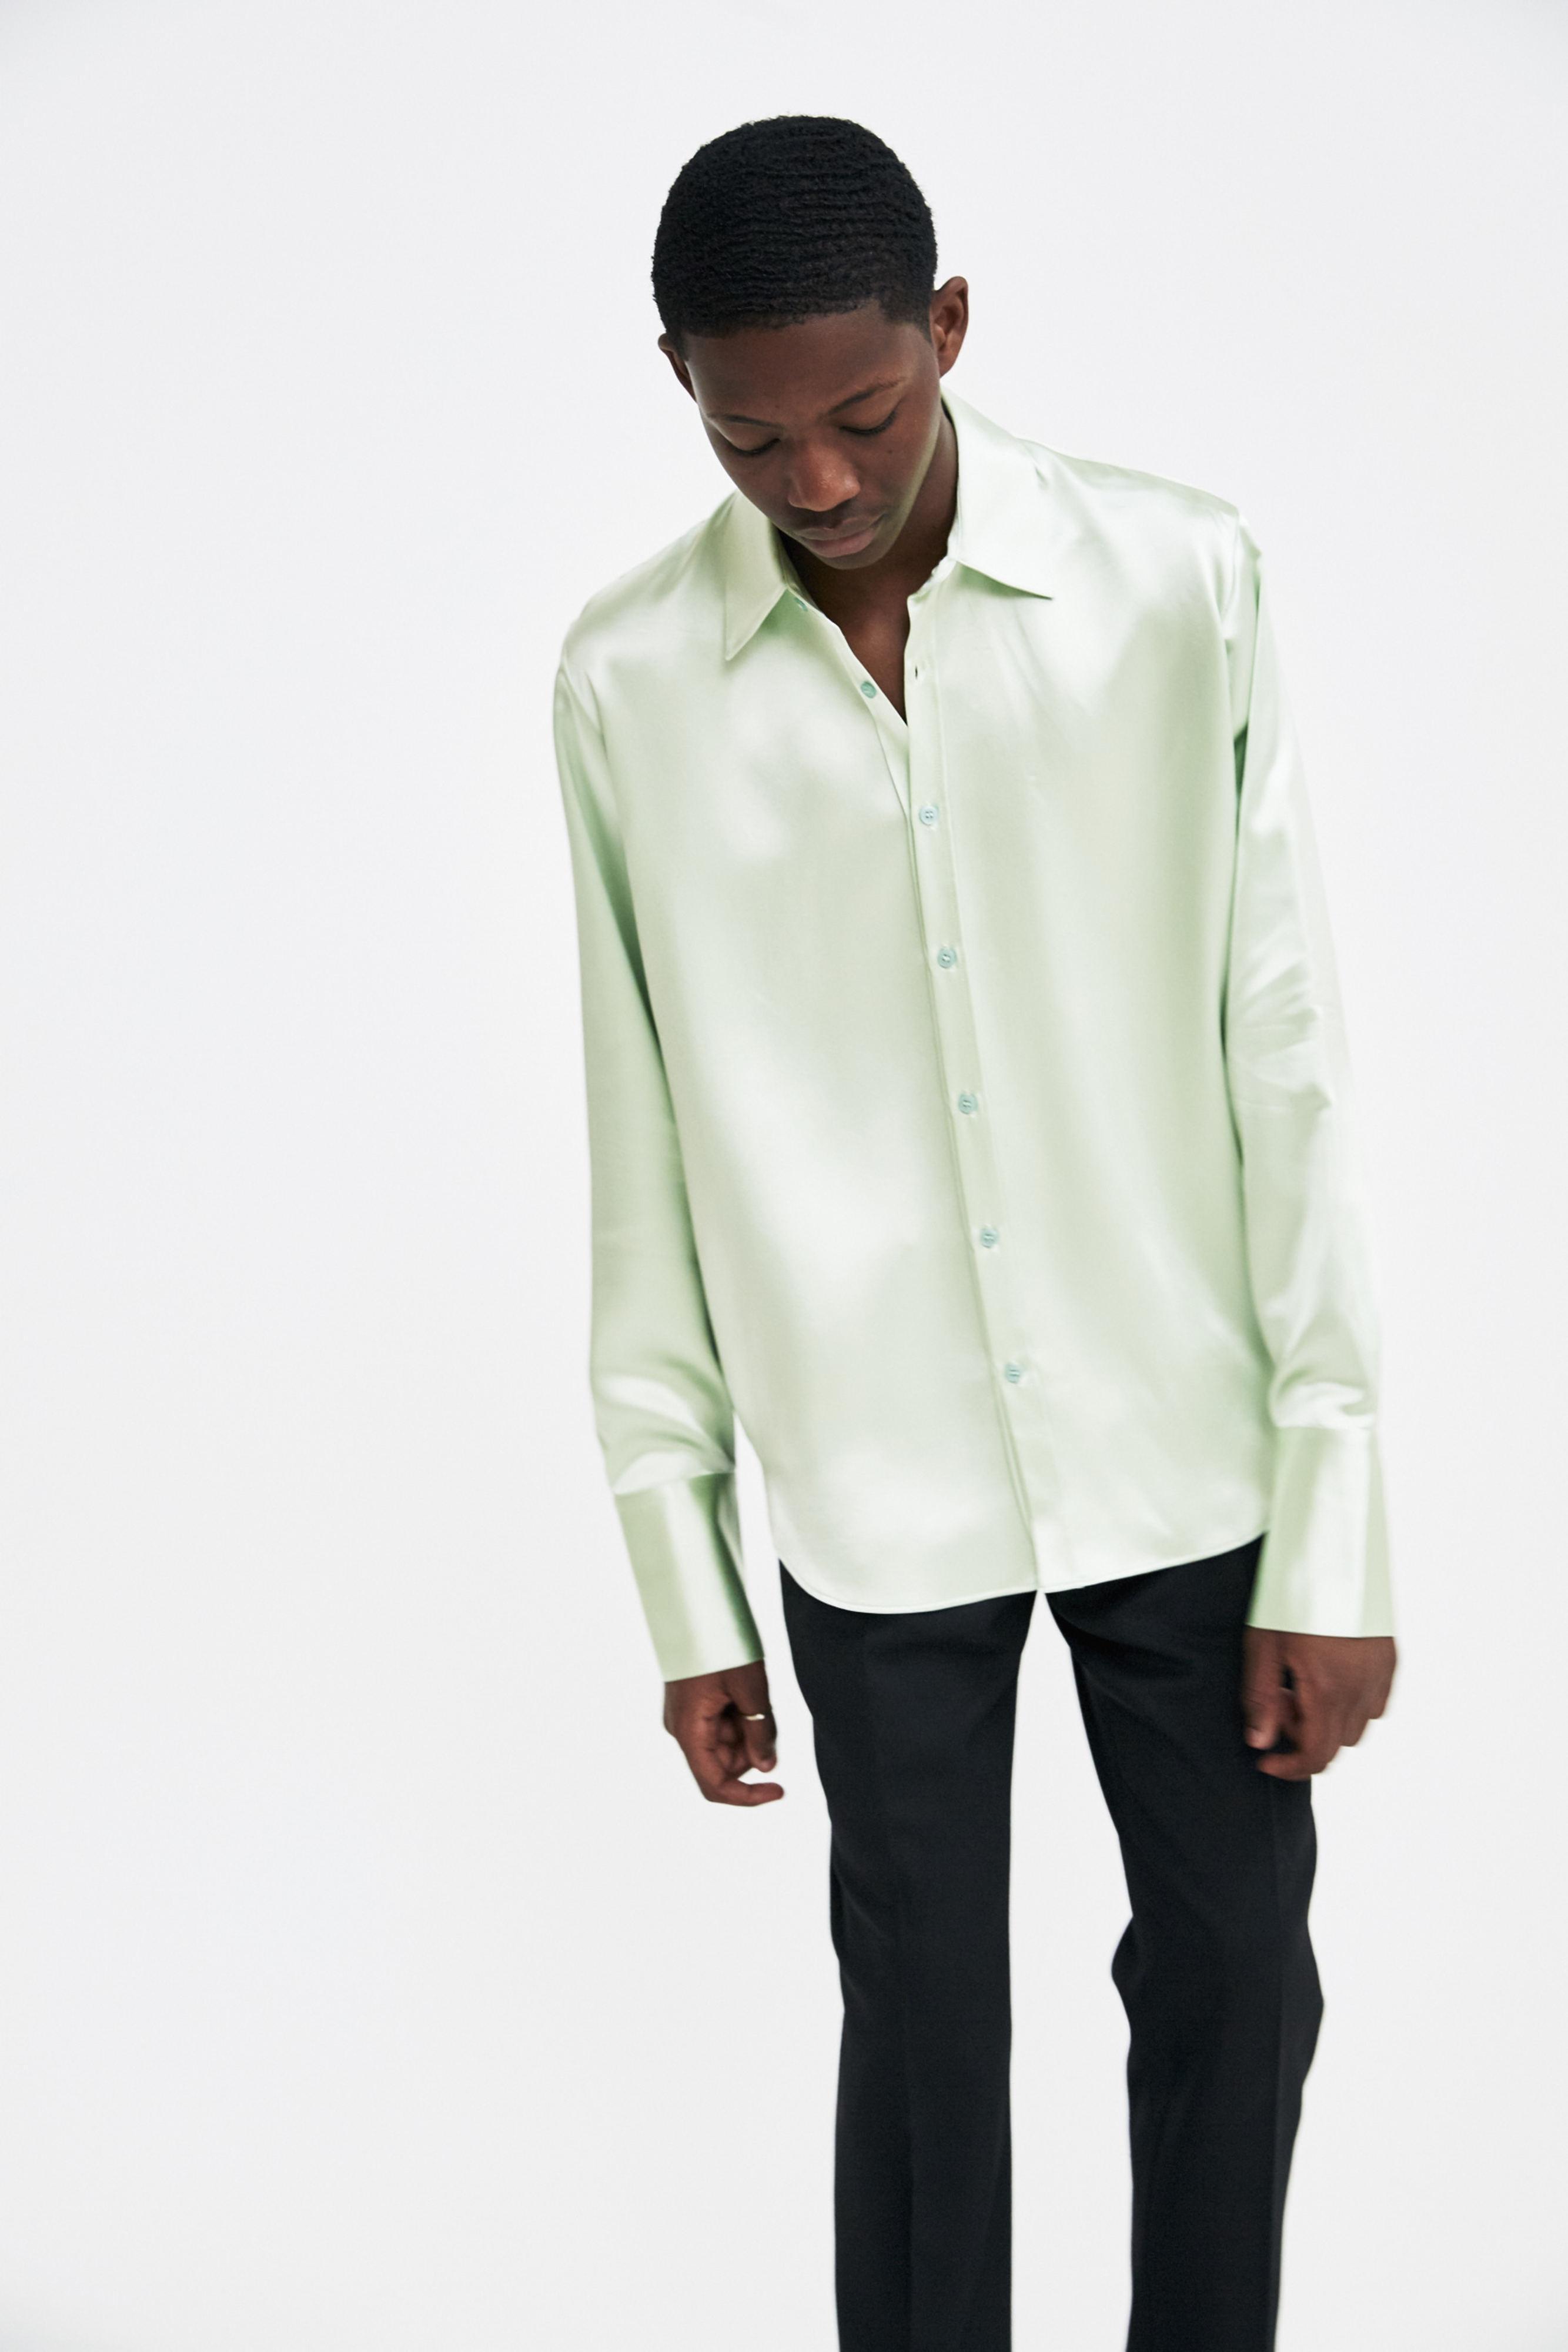 39647d544b3c5f Lyst - Martine Rose Green Silk Shirt in Green for Men